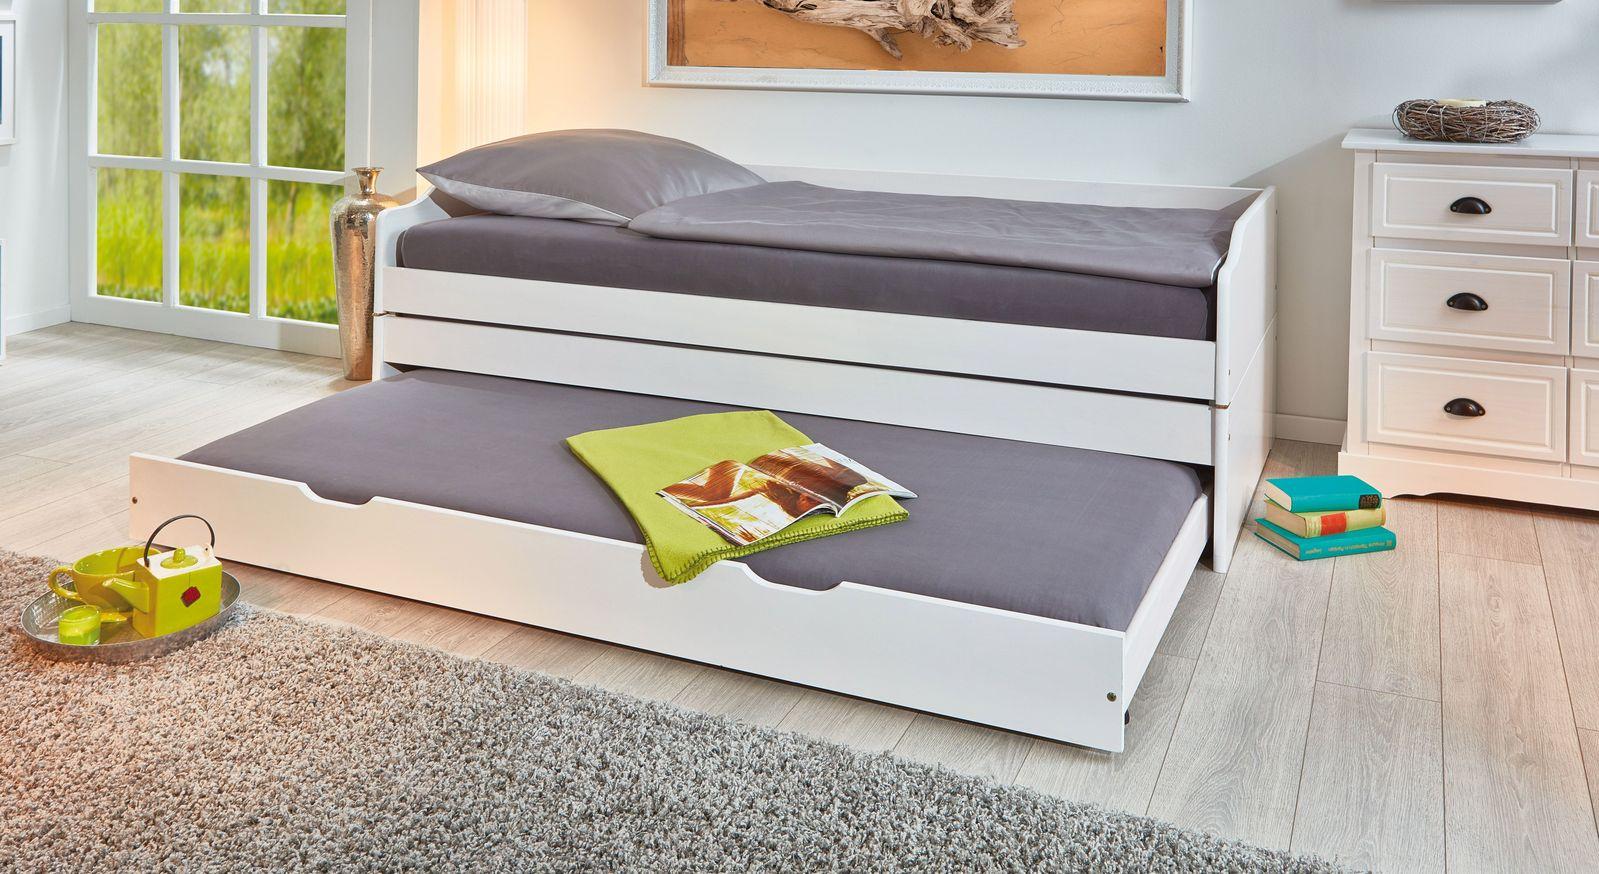 3-in-1 Funktionsbett als Doppelbett für Gäste